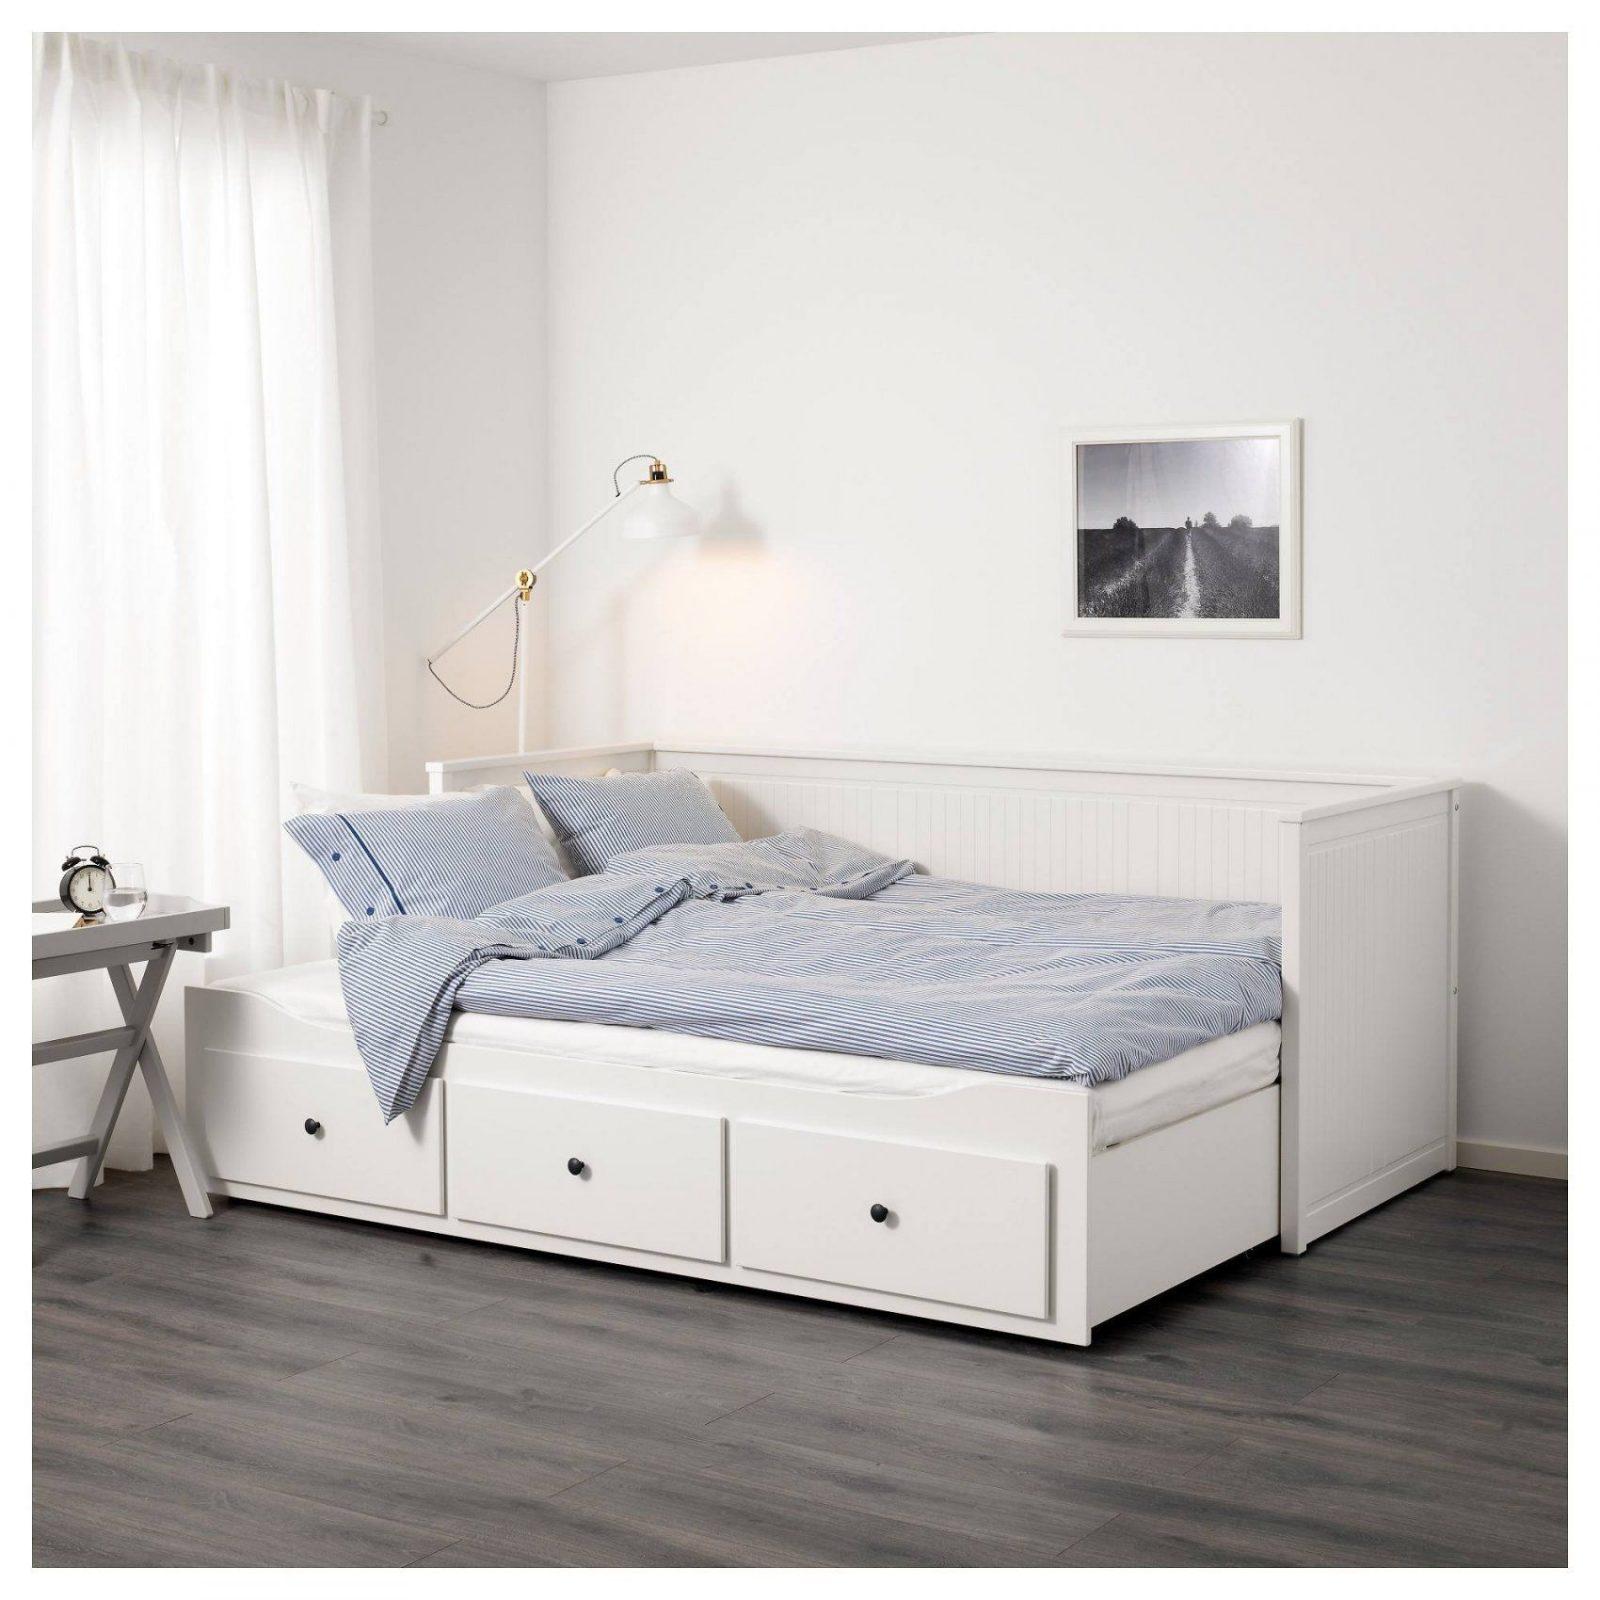 Ikea Weisses Bett Atemberaubend Inspiration Über Ikea Weisses Bett Von Ikea  Hemnes Tagesbett Bewertung Photo